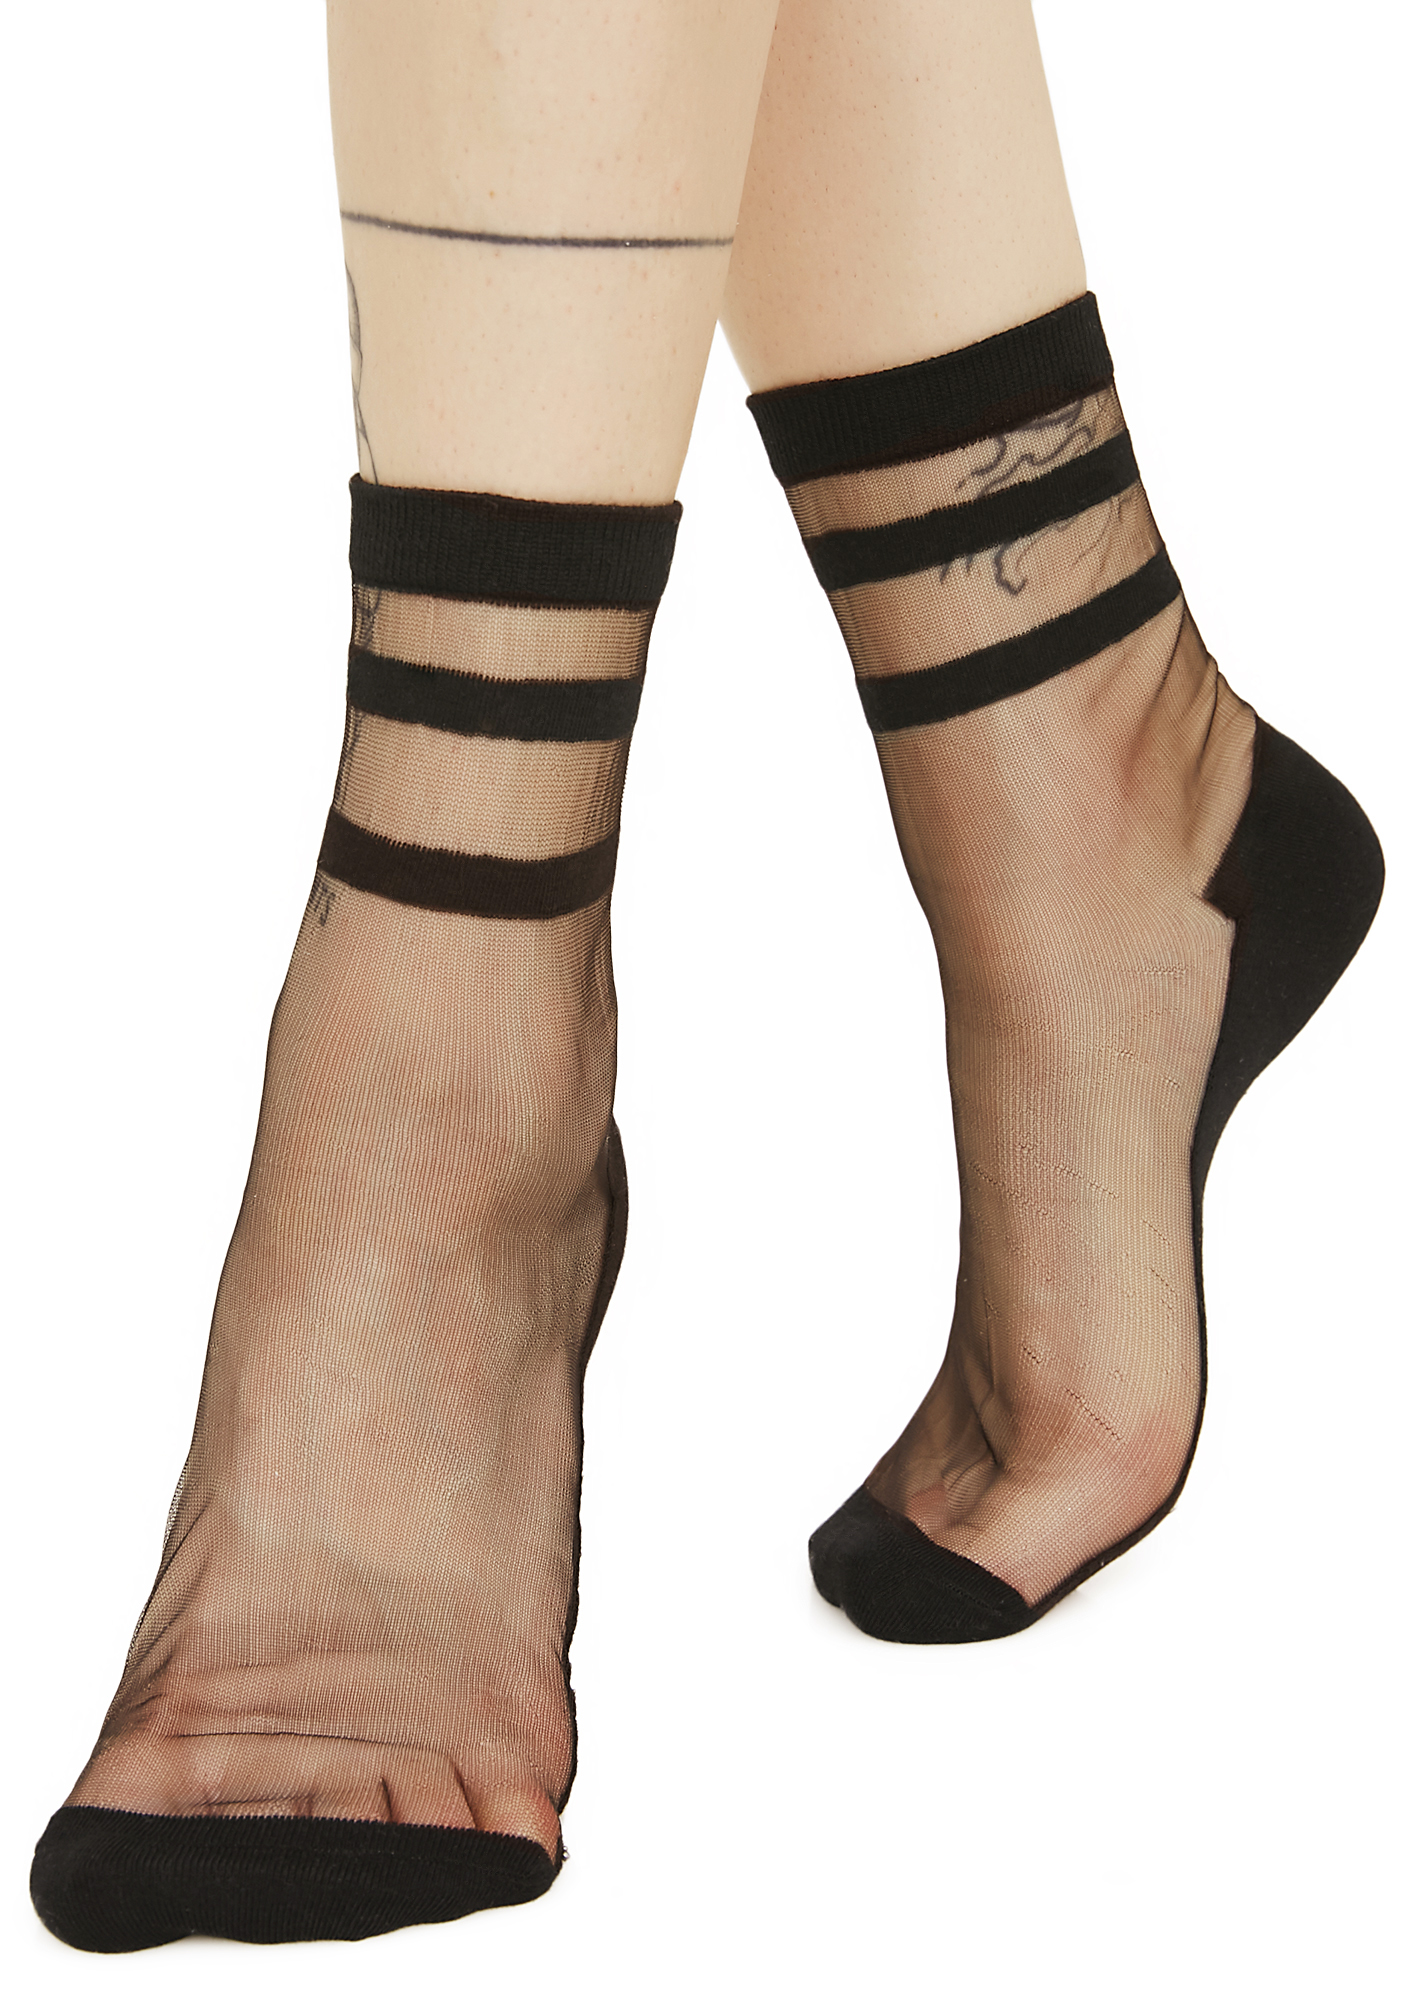 Black Sheer Athletic Stripe Ankle Socks